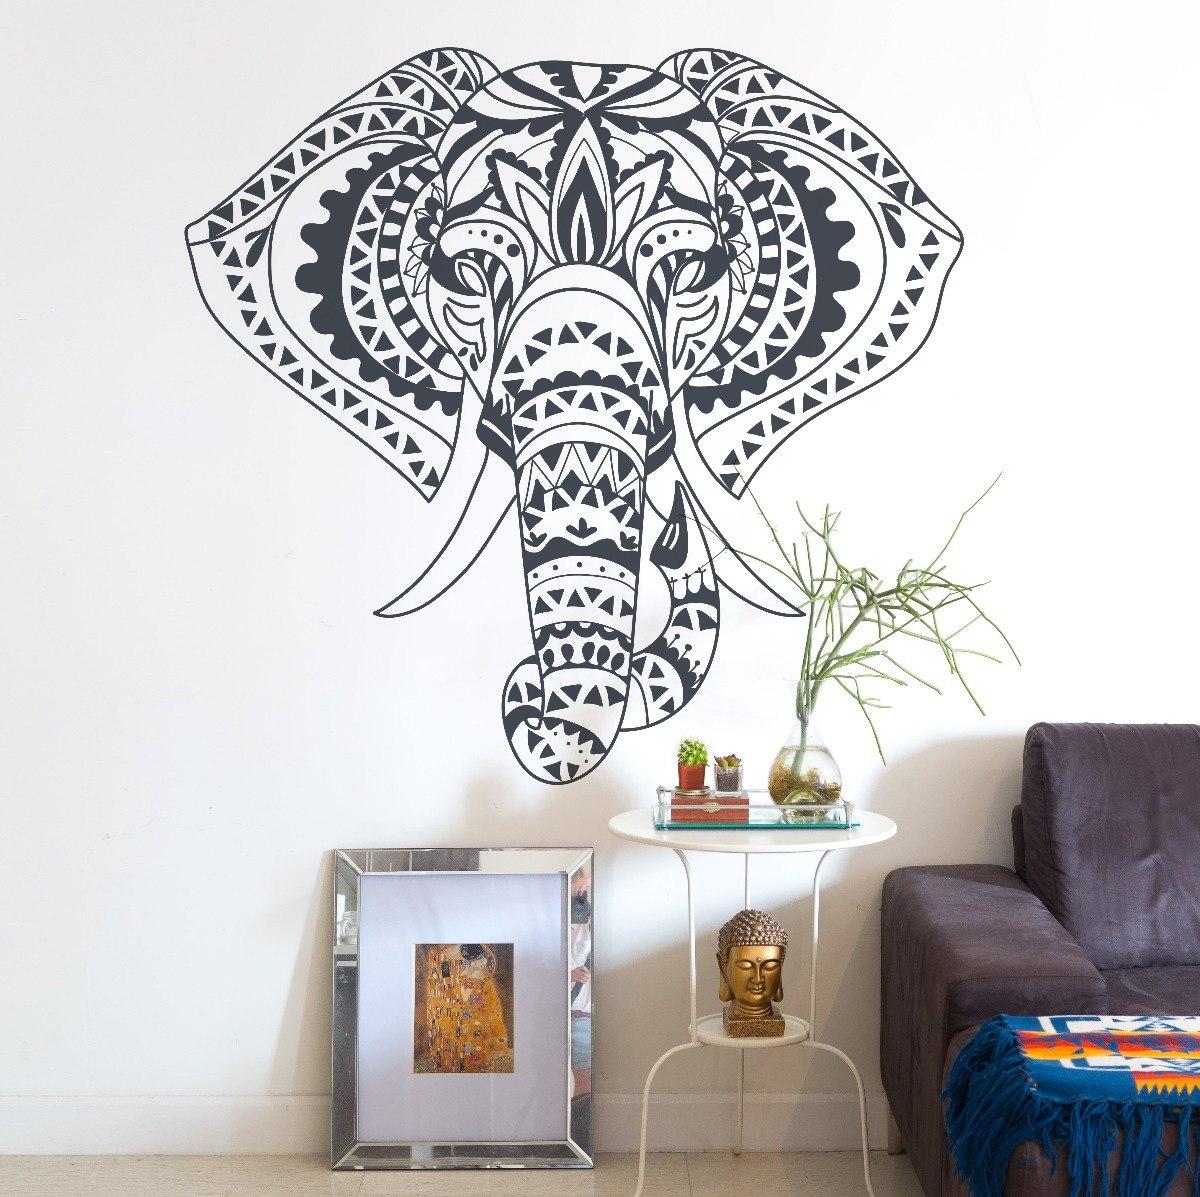 Vinilo decorativo elefantes mandala pared varios dise os for Vinilos pared mandalas